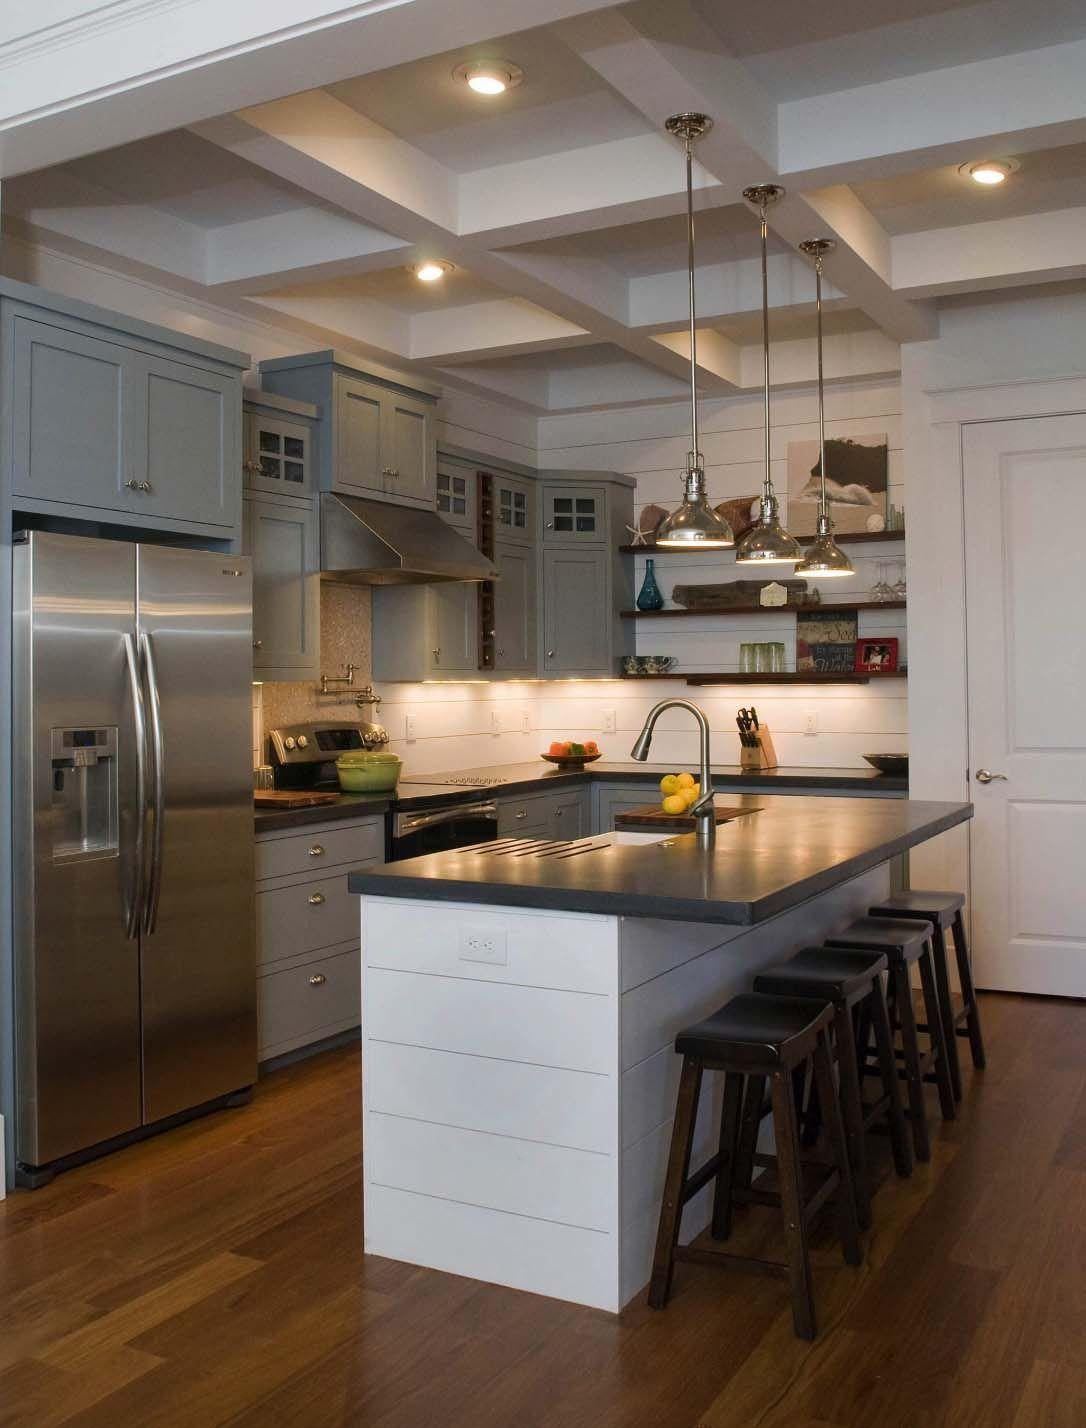 17 Square Hammered Copper Kitchen Bar Prep Sink In 2020 Copper Kitchen Prep Sink Sink